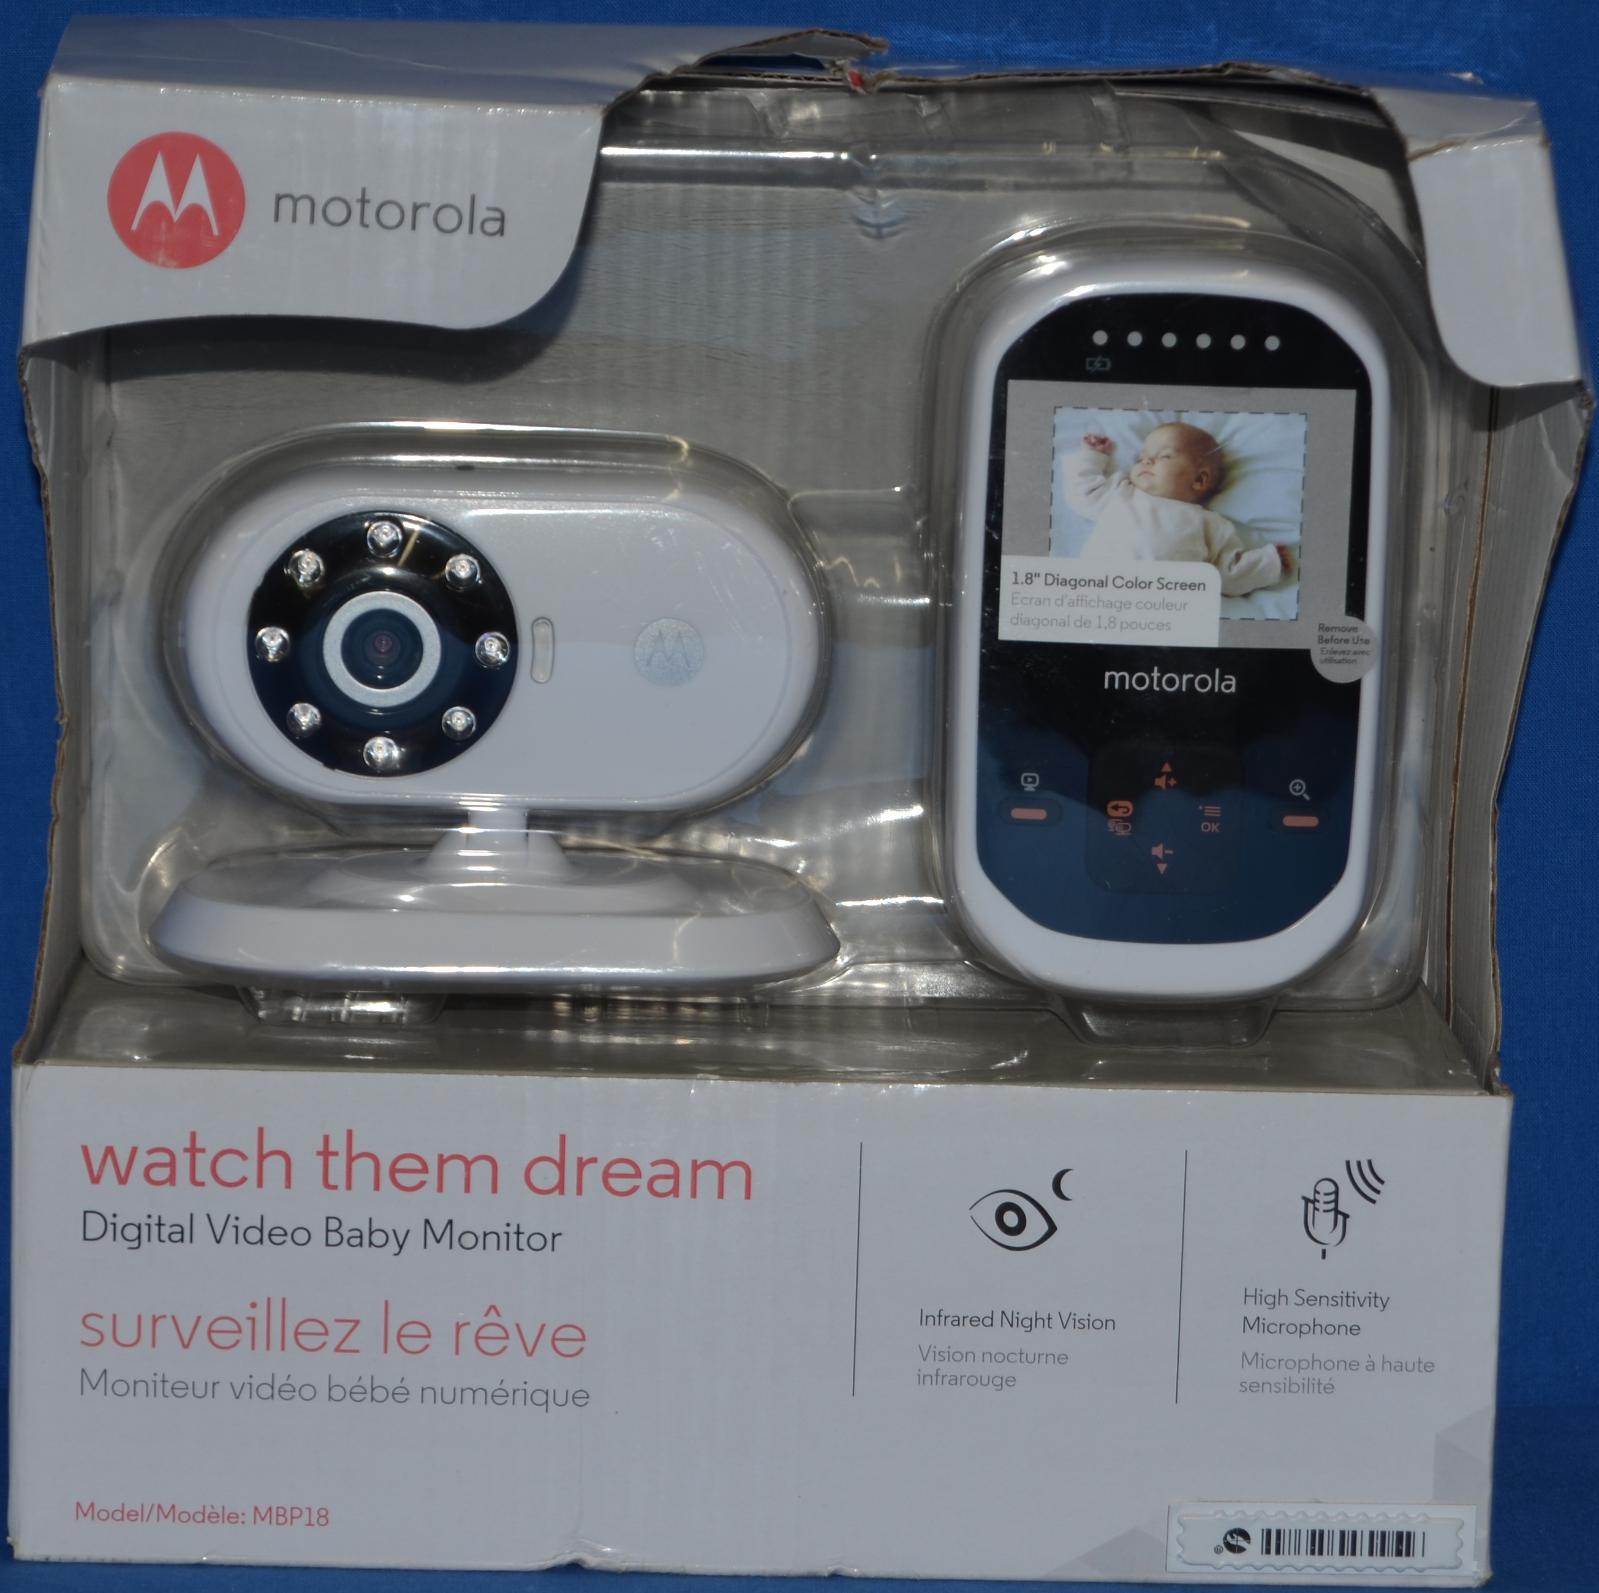 Motorola MBP18 Digital Wireless Video Baby Monitor with 1.8-